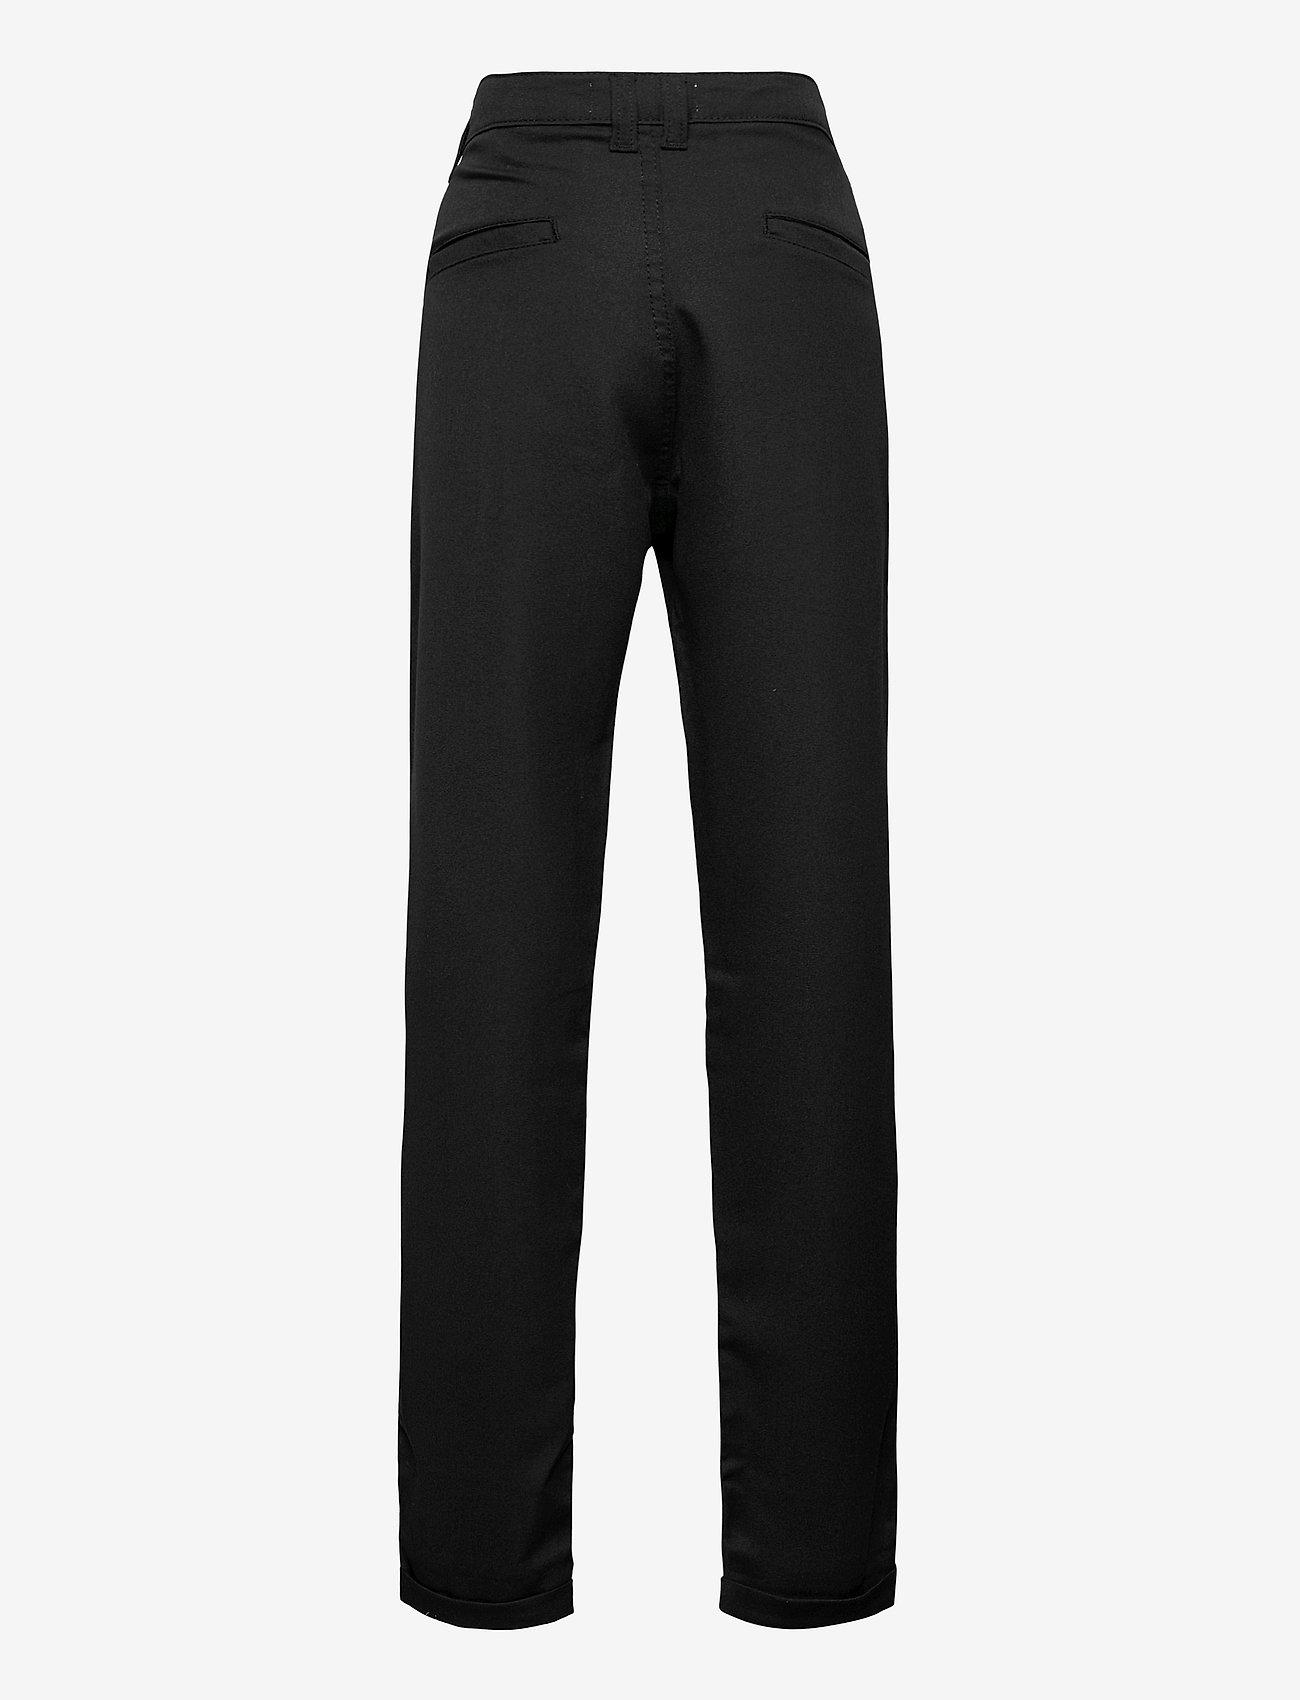 Costbart - CHRINS CHINNO CROPPED PANTR - pantalons - black - 1